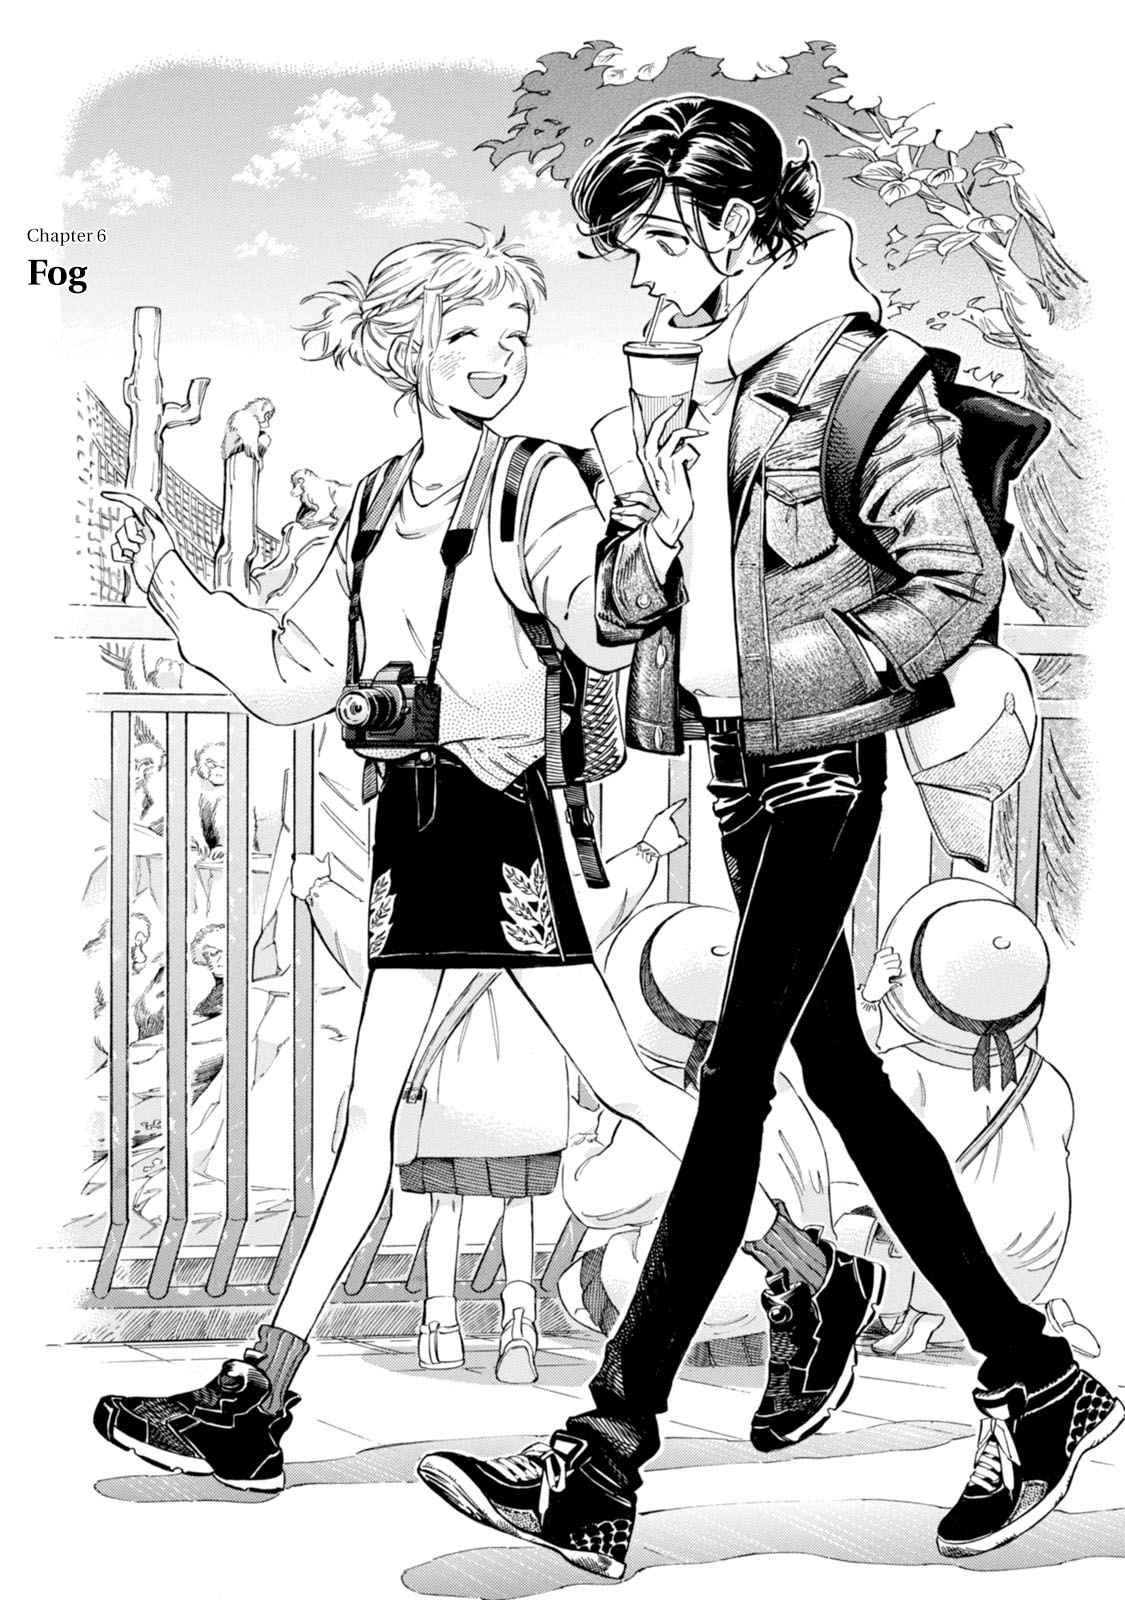 https://img3.nineanime.com/comics/pic4/36/42788/2760847/0f73ede5d16cee6965344290706c986c.jpg Page 1